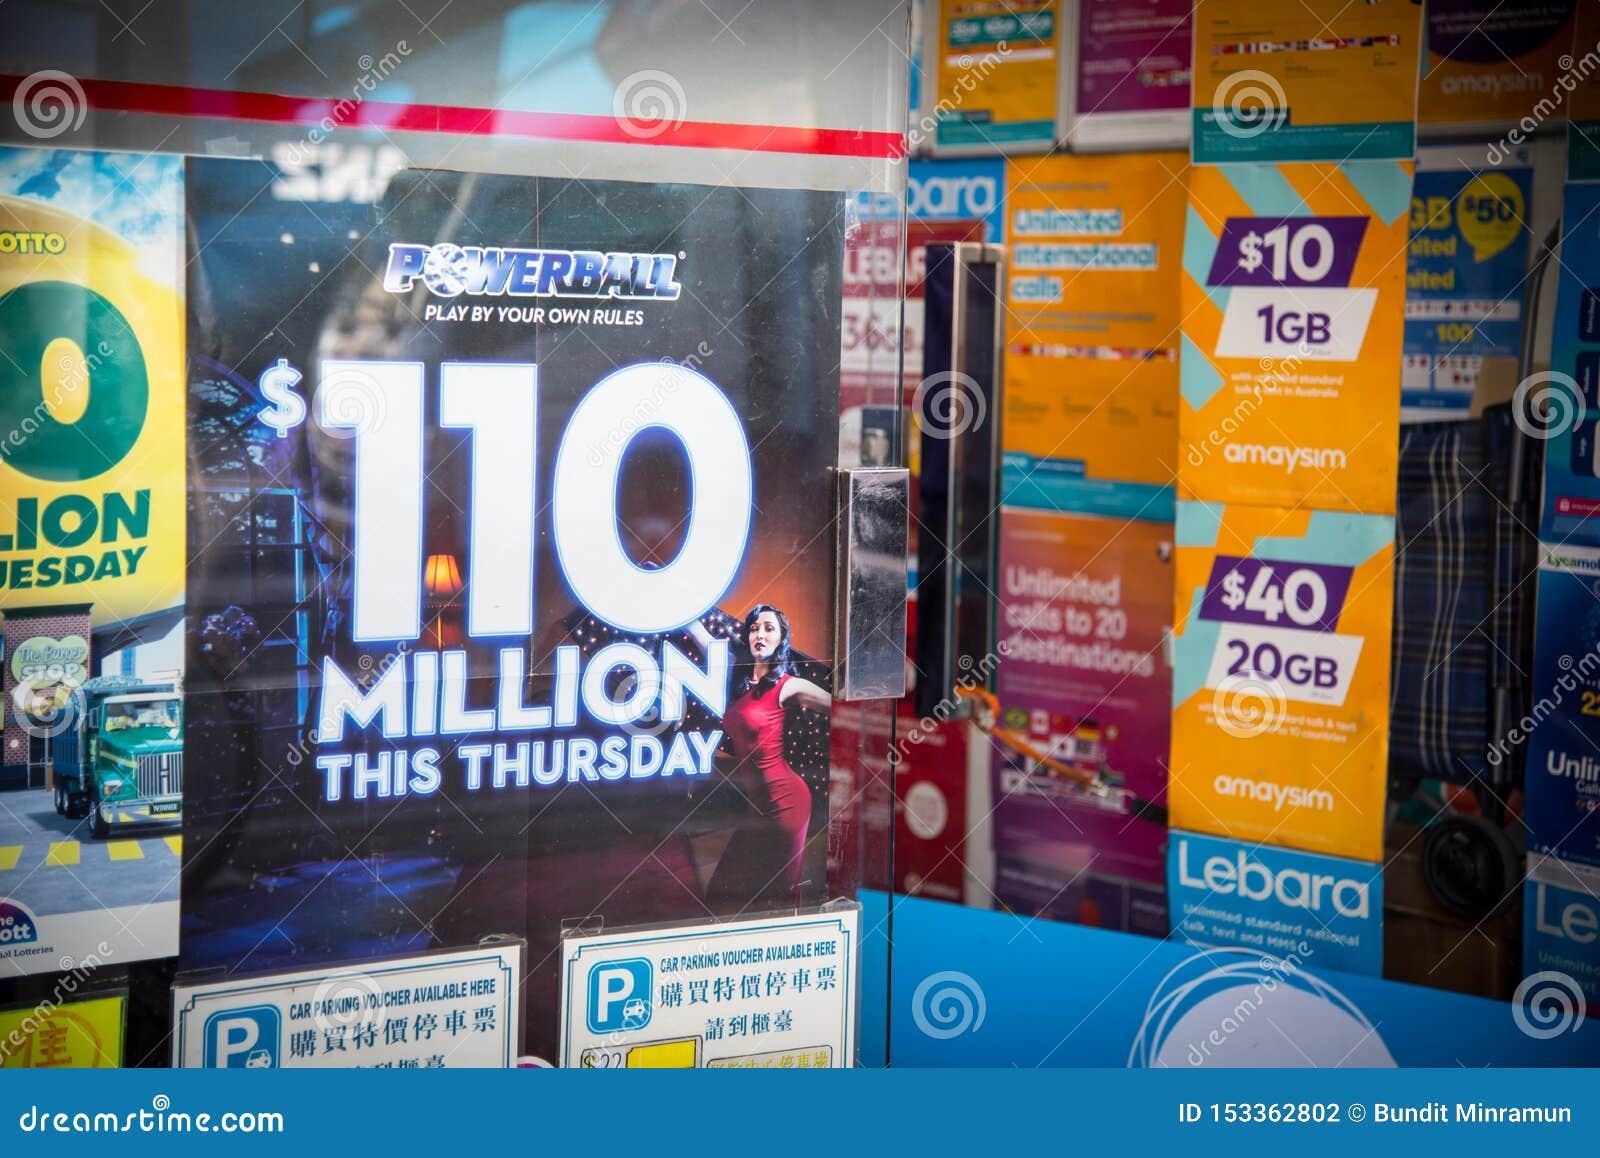 Biggest Lottery In Australia